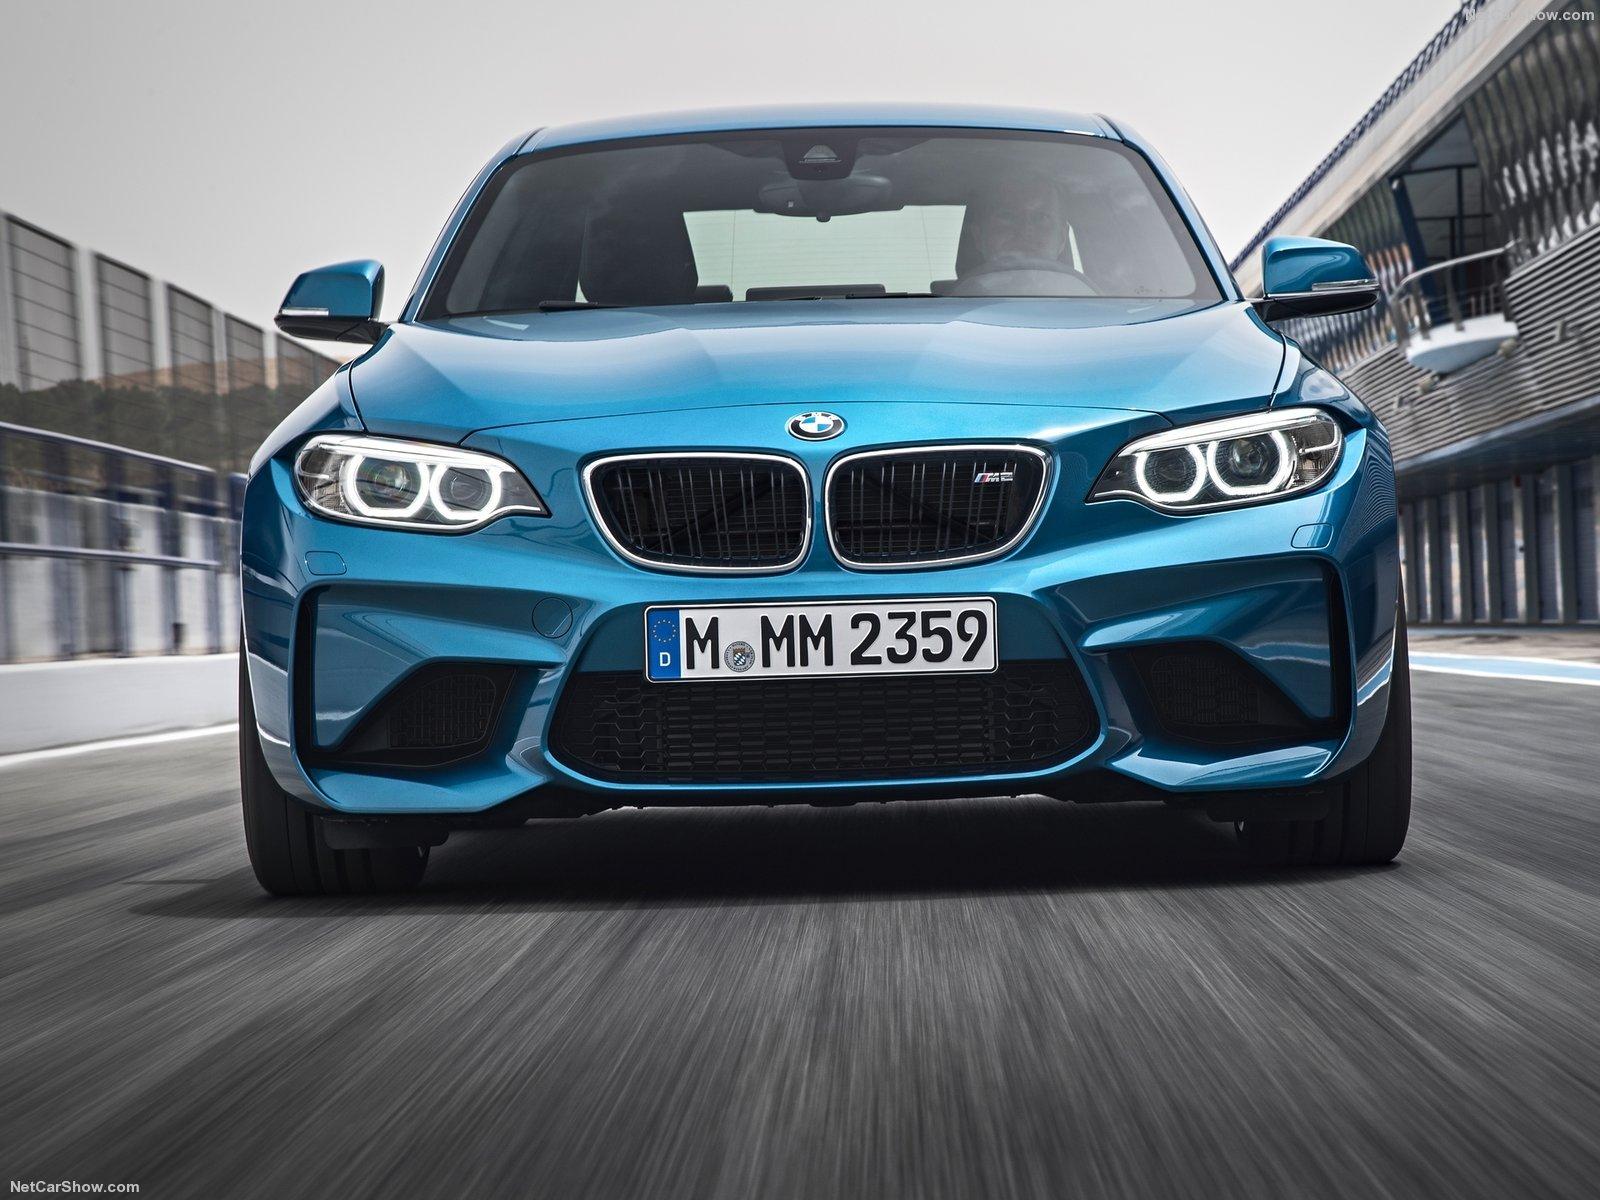 BMW M2 Coupe cars 2016 wallpaper 1600x1200 819367 WallpaperUP 1600x1200